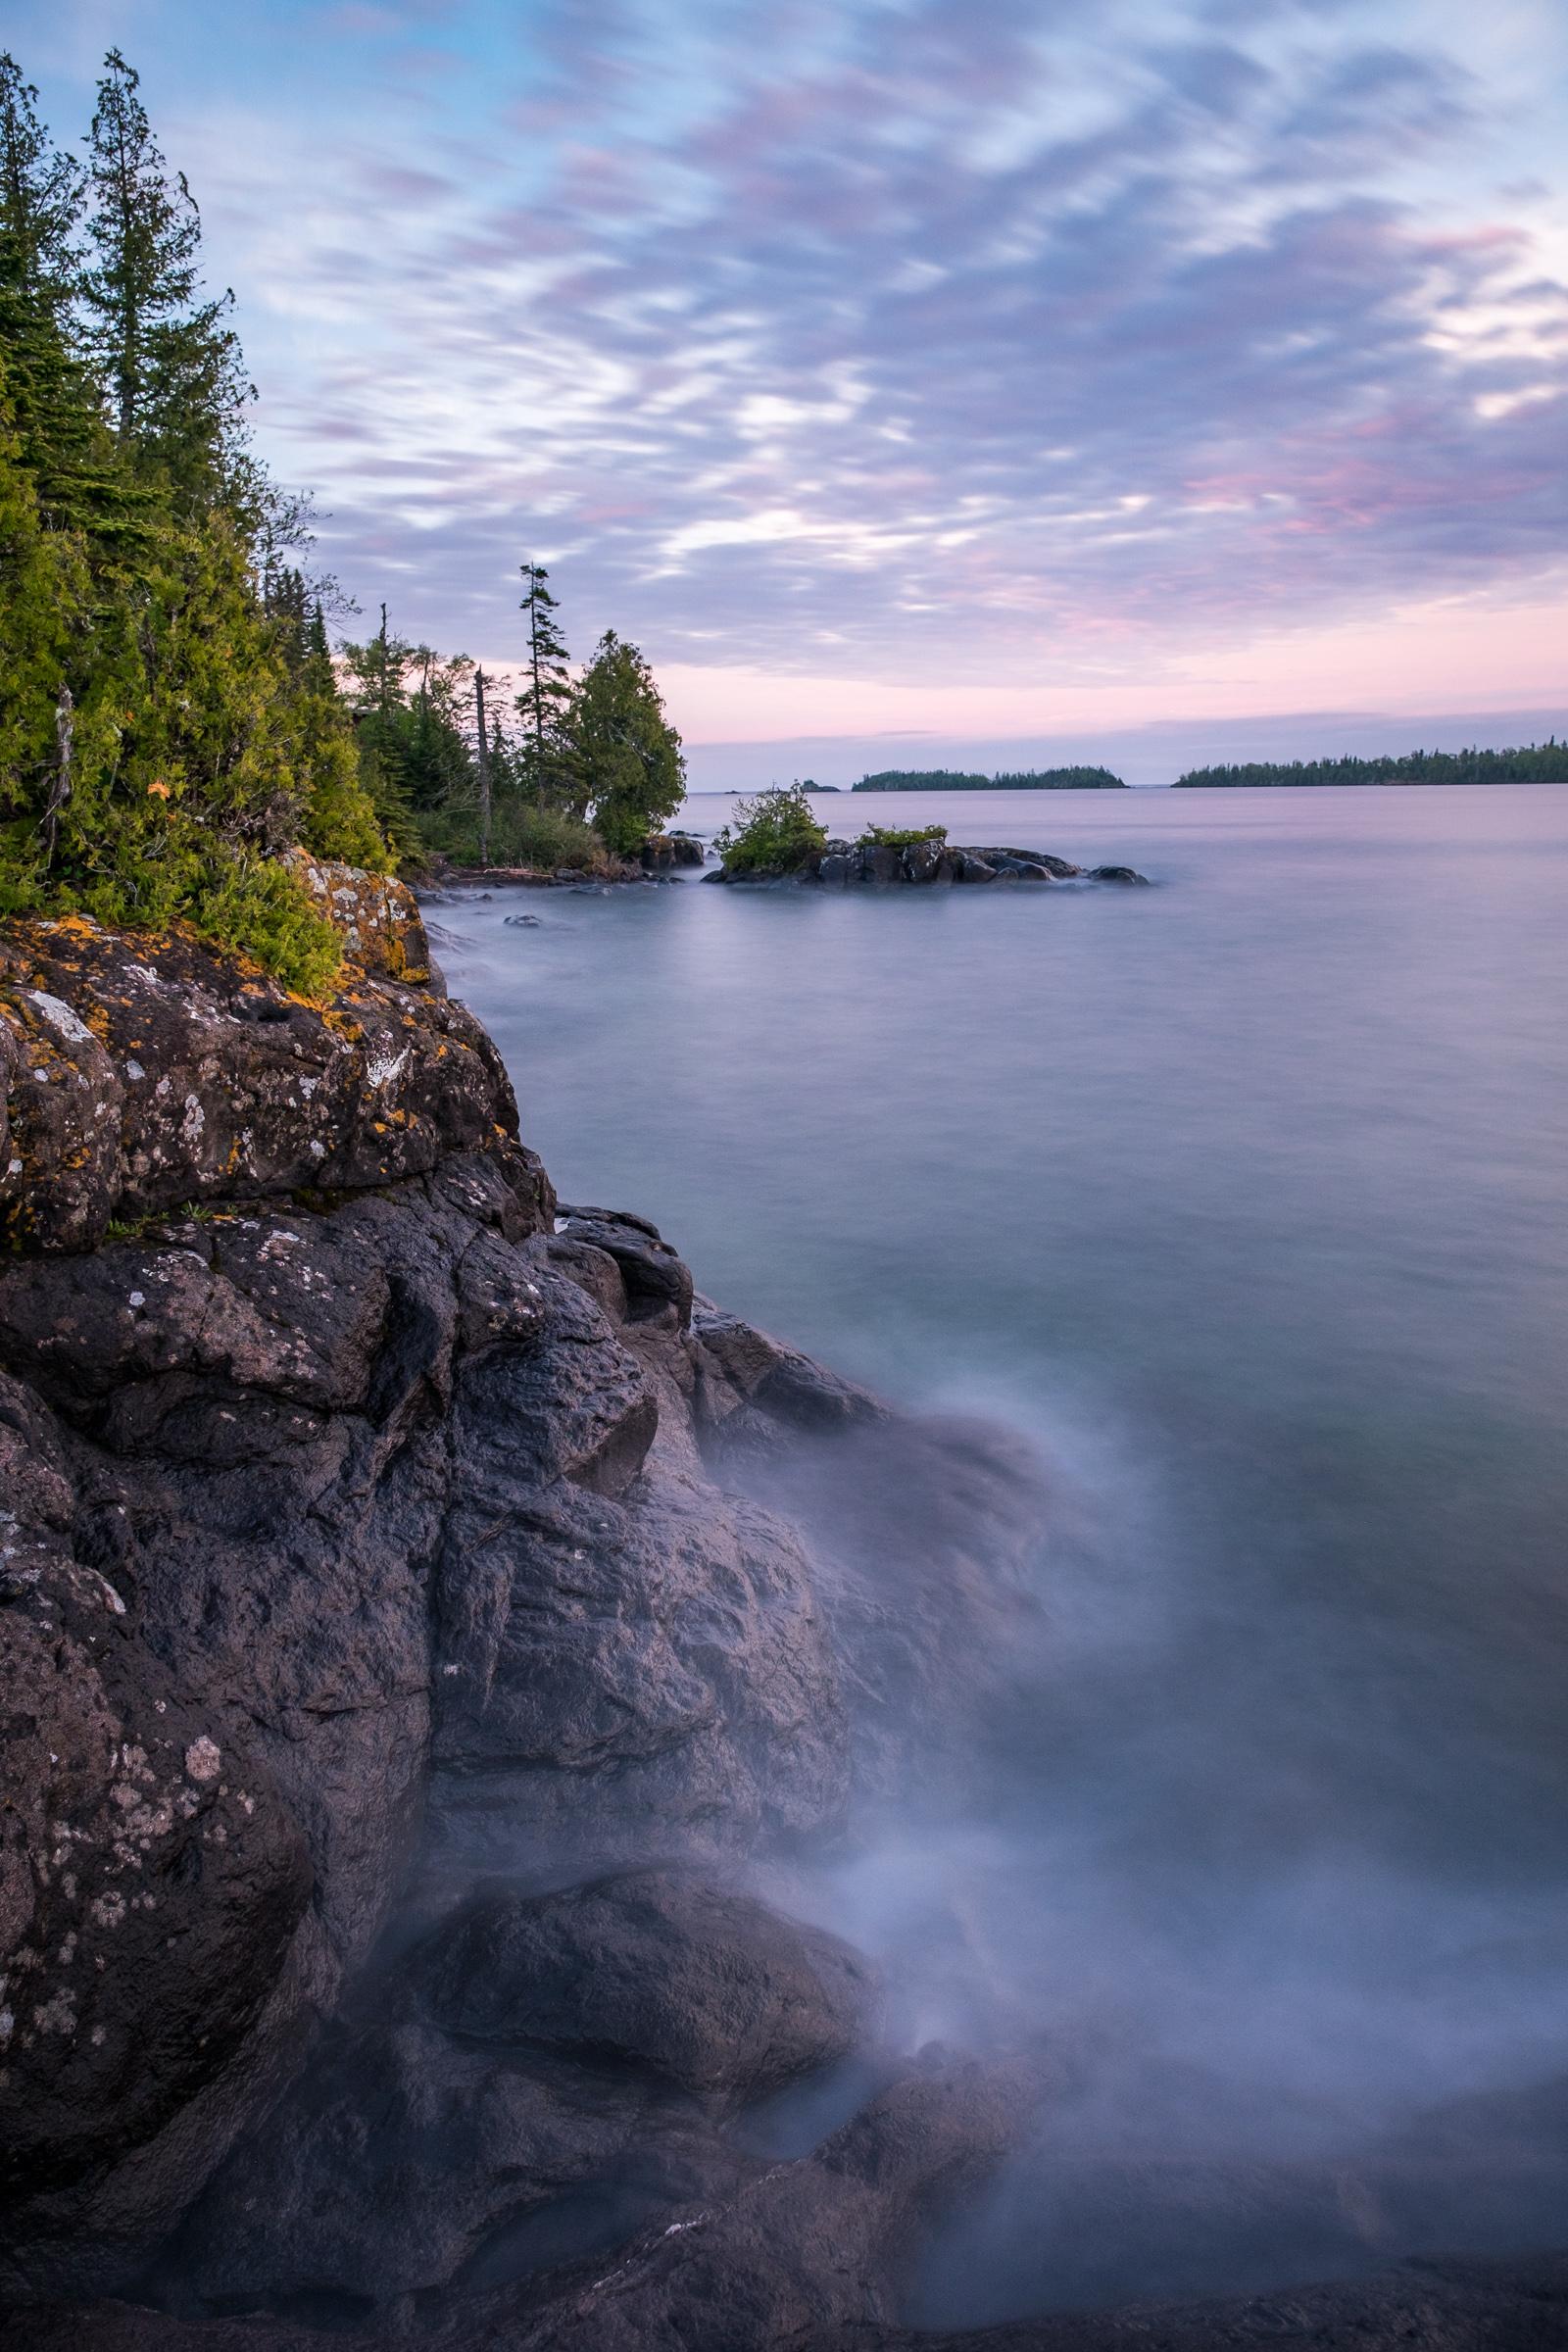 20160610-JI-Isle Royale National Park-_DSF0473.jpg